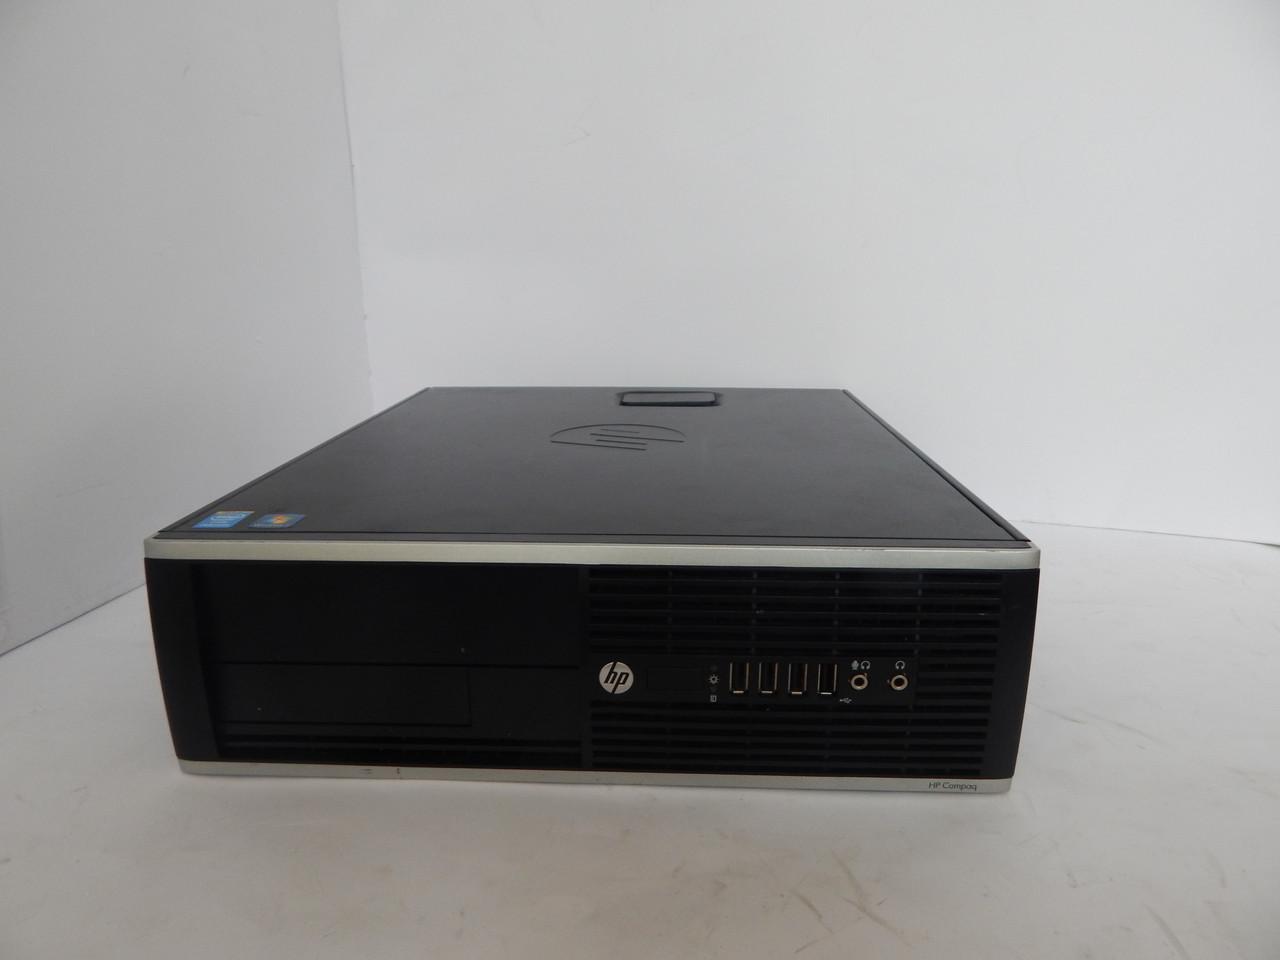 Системный блок HP 8300 i5-3570 ОЗУ4 ГБ 250 ГБ USB 3.0